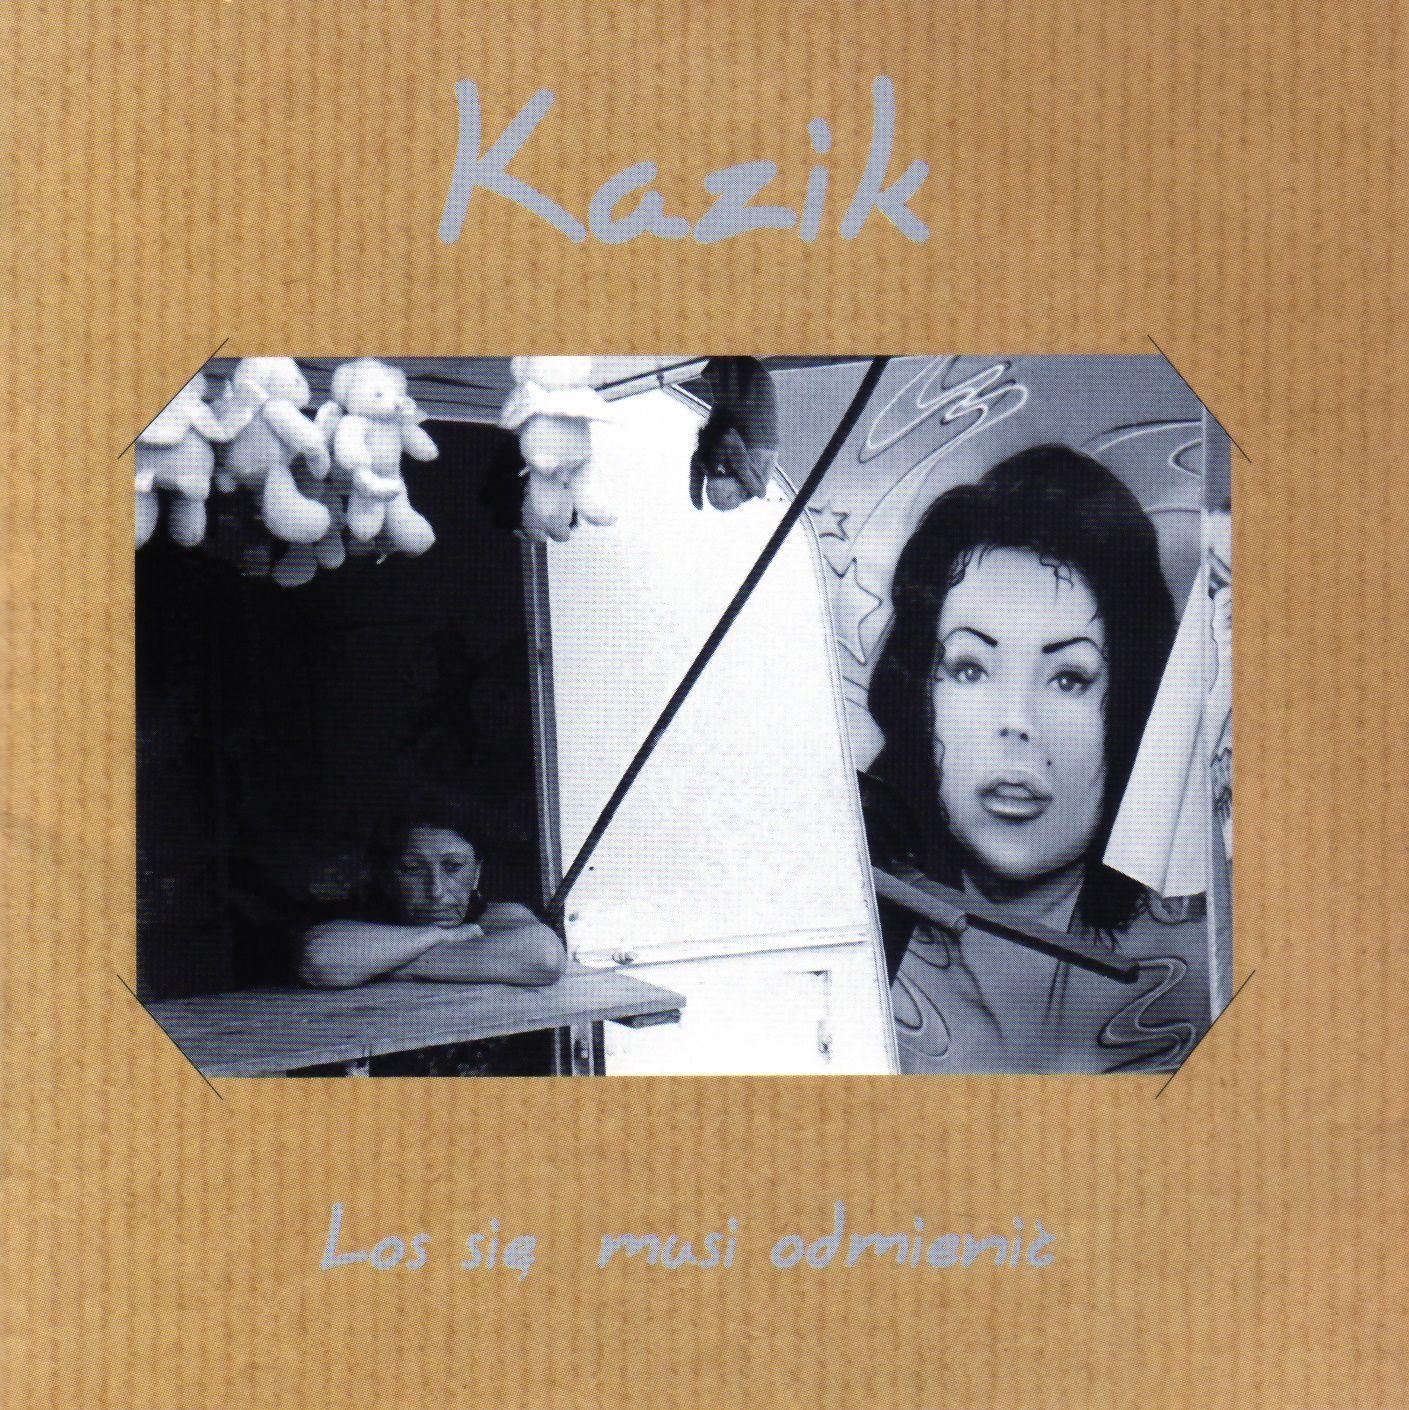 Kazik - Los Się Musi Odmienić album cover